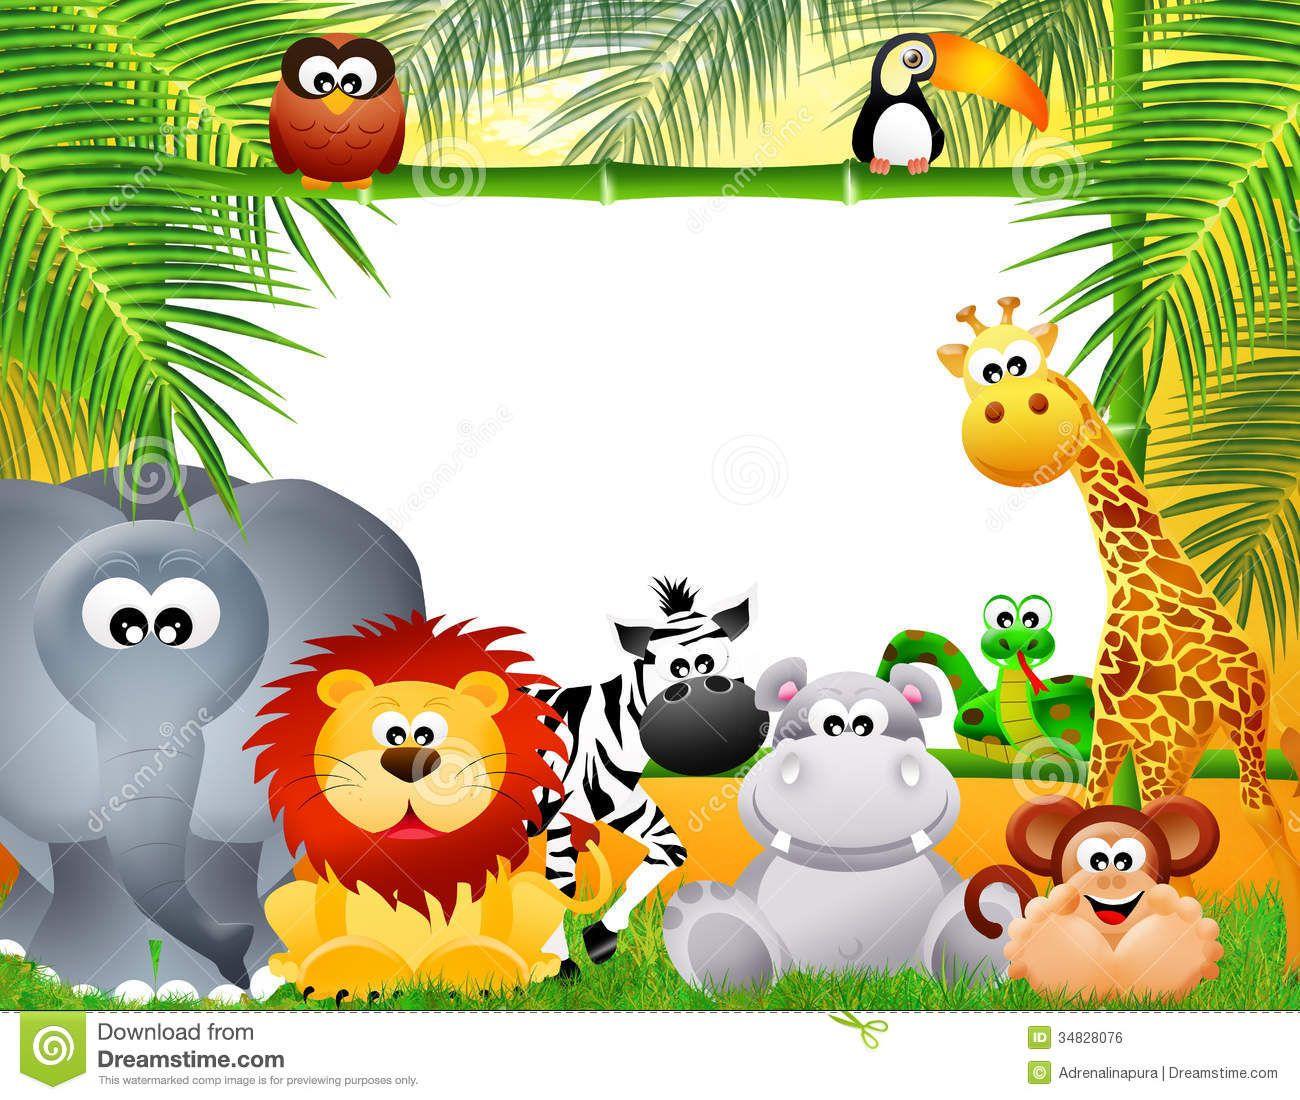 Zoo animal border clipart free clipart royalty free library Zoo Animals Cartoon Royalty Free Stock Image - Image ... clipart royalty free library